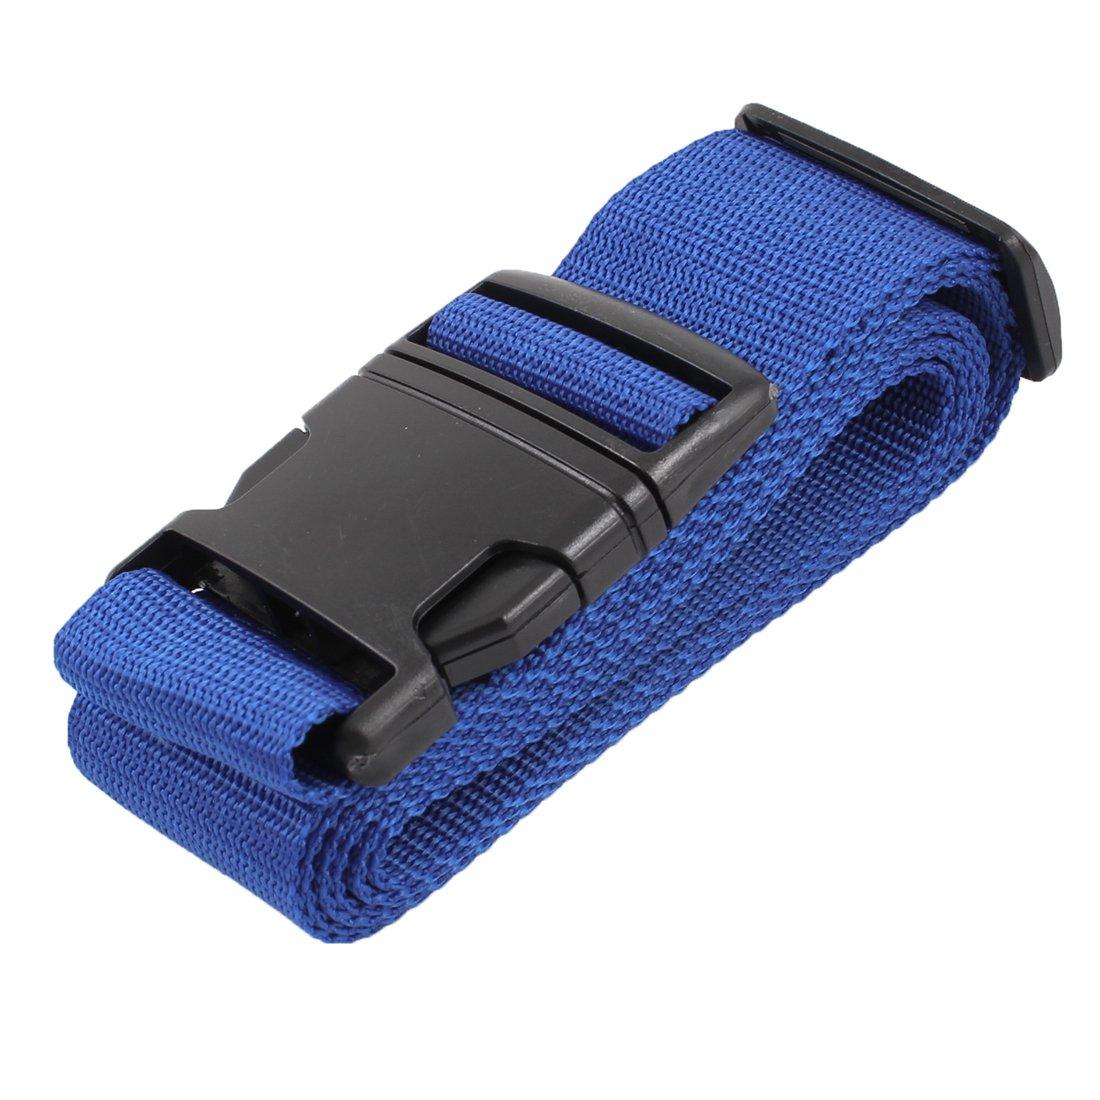 TEXU Plastic Release Buckle Adjustable Luggage Strap Belt Black Blue luggage belt strap w quick release buckle id tag blue grey black 2m